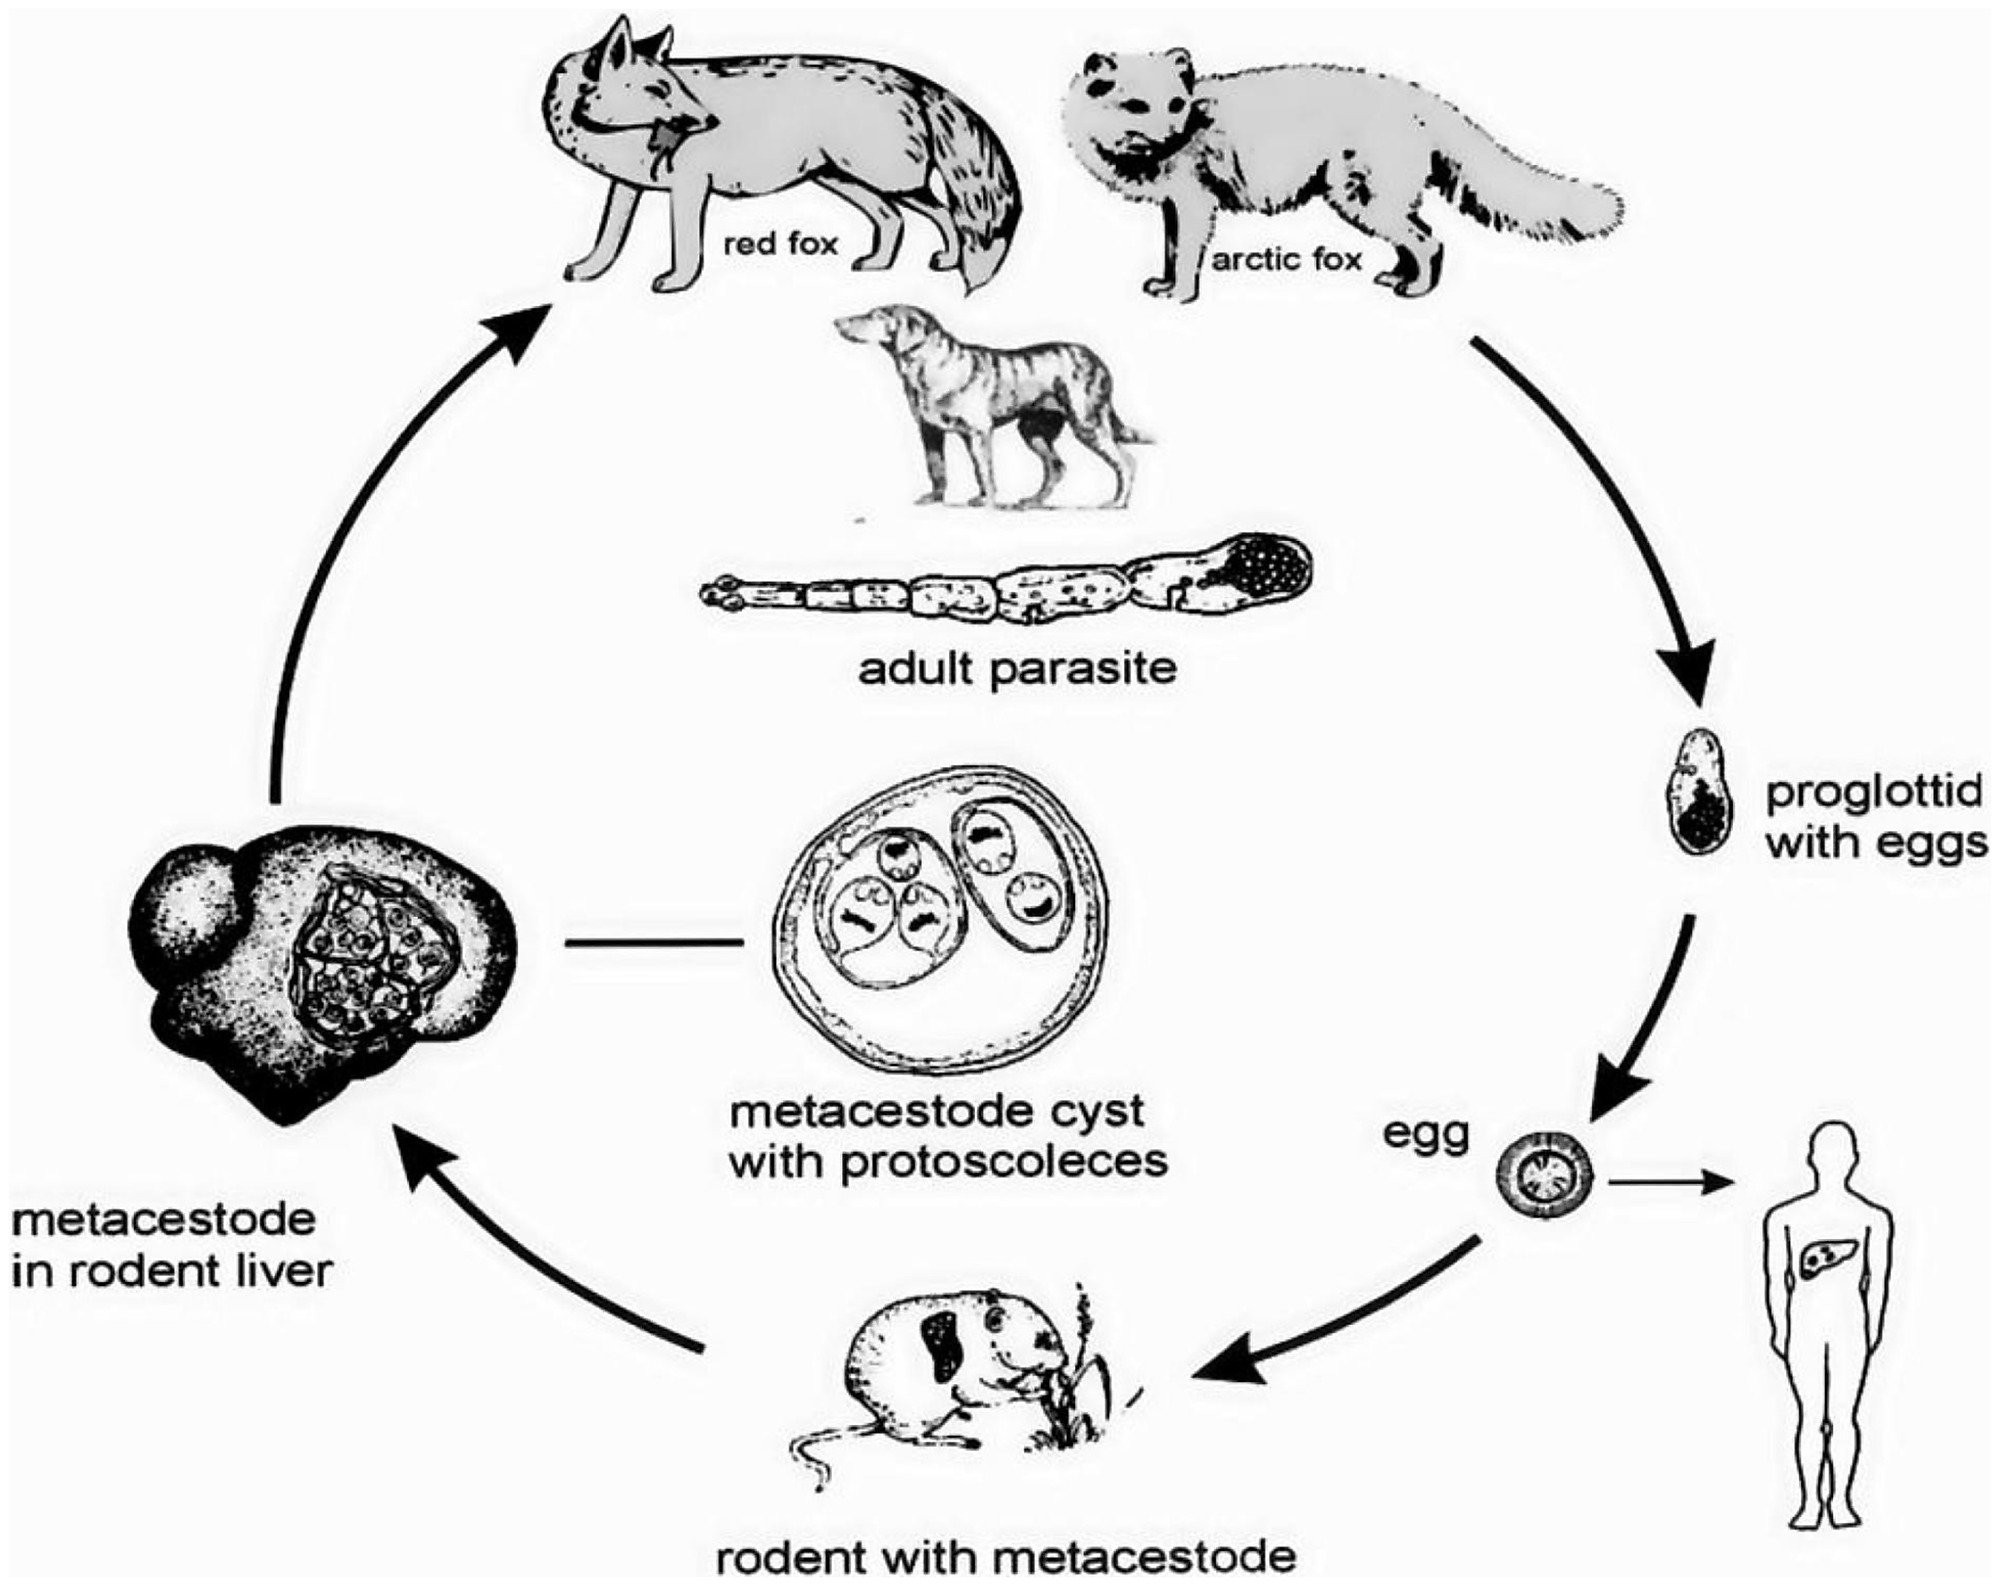 File The Life Cycle Of Echinococcus Multilocularis